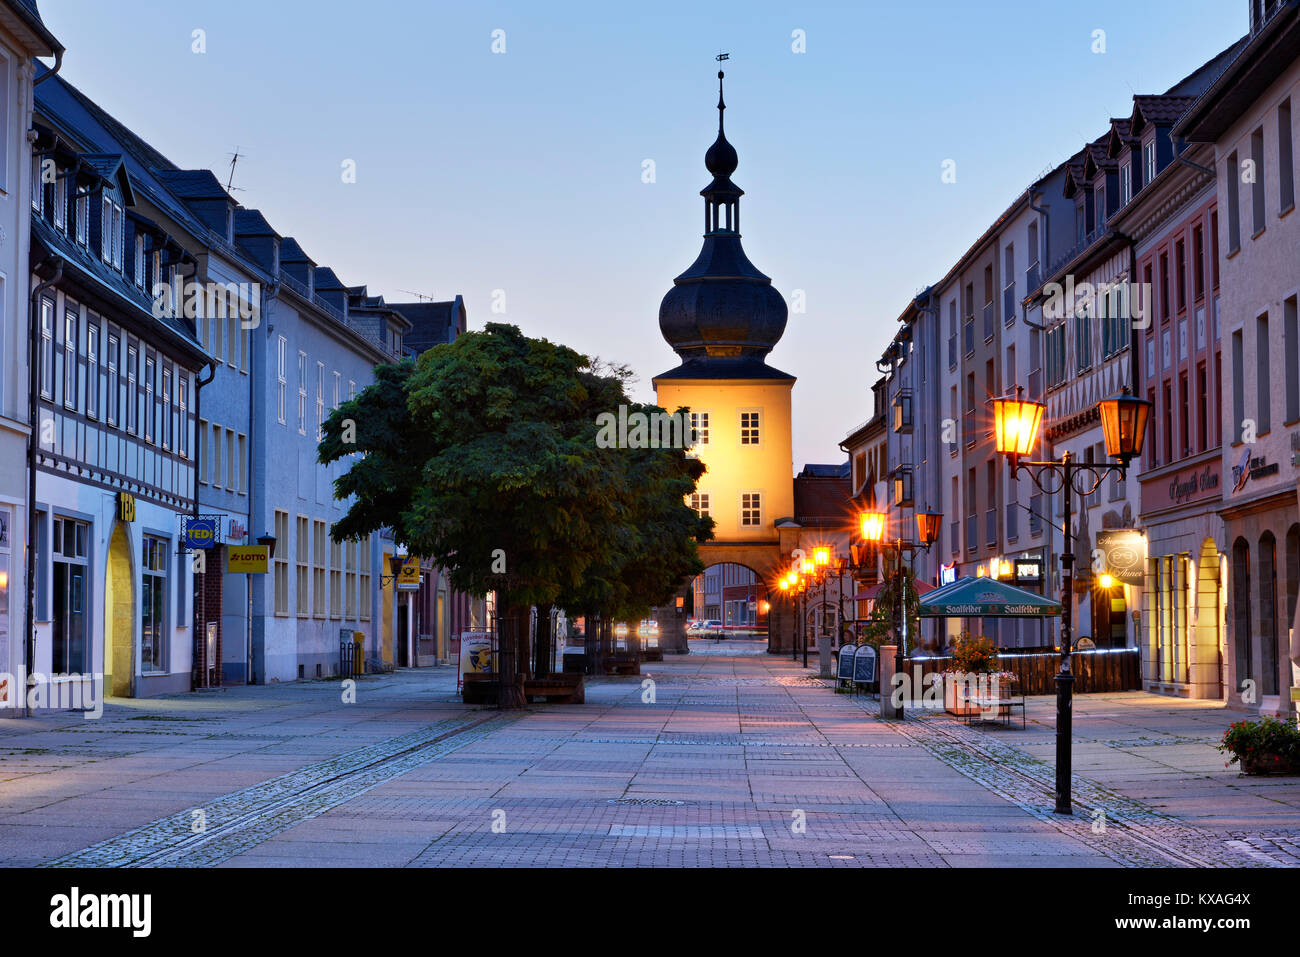 Blankenburger Tor and pedestrian precinct,dusk,Saalfeld,Thuringia,Germany - Stock Image